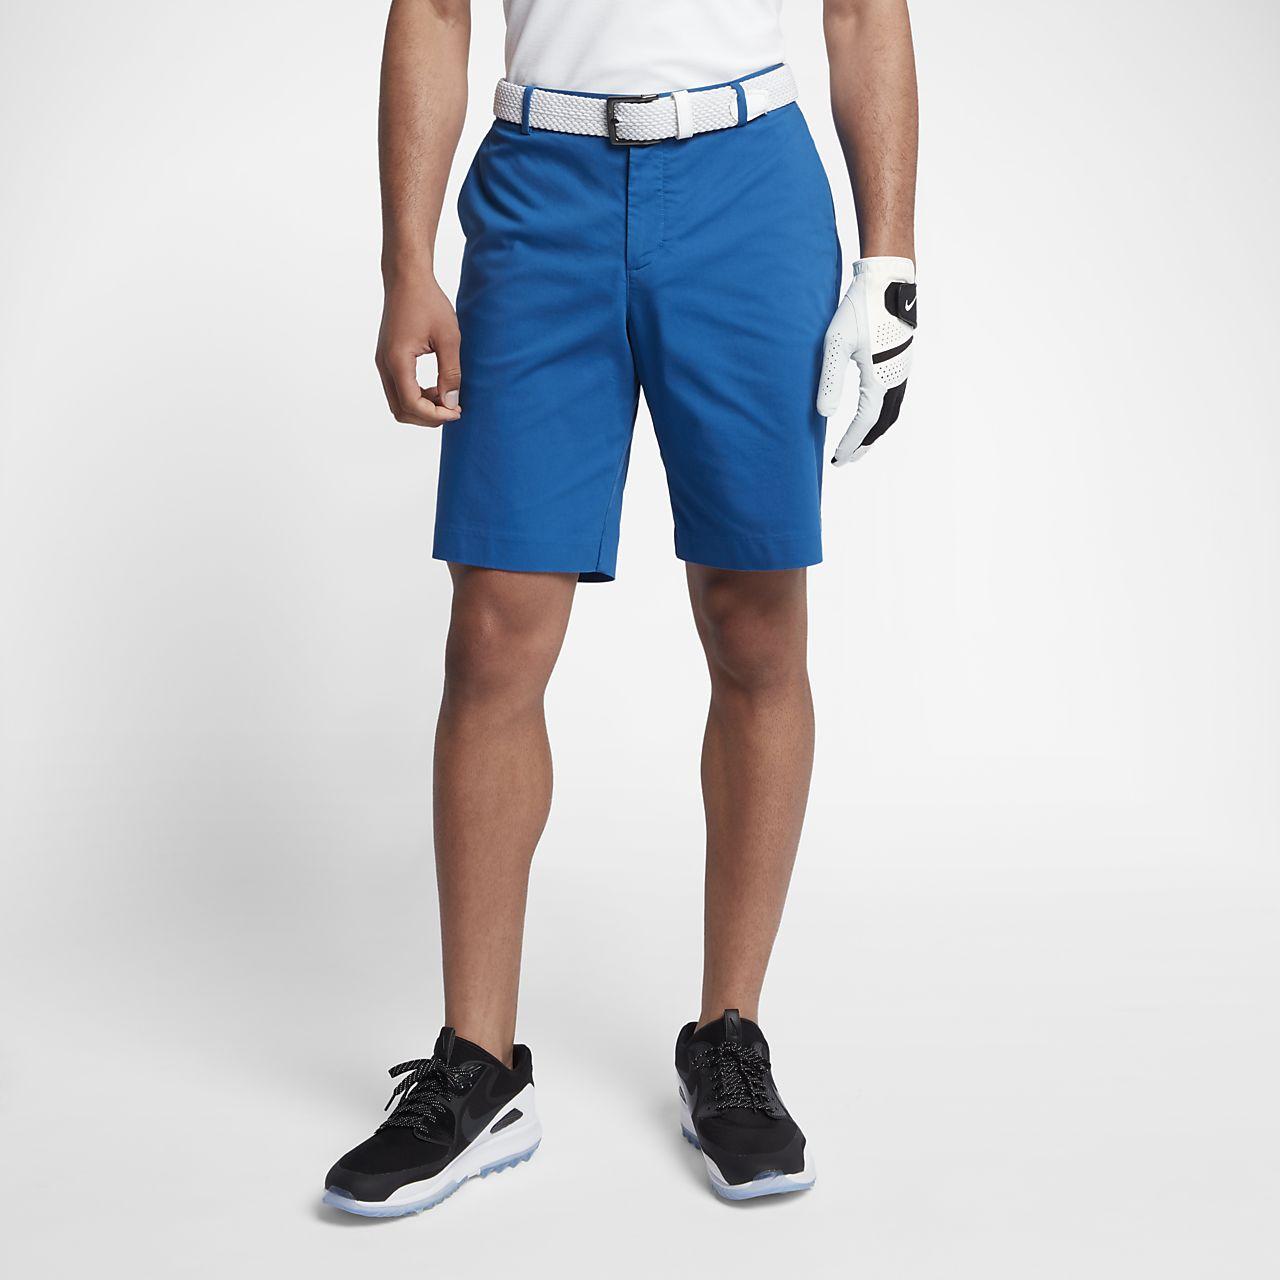 ... Nike Modern Fit Washed Men's Golf Shorts